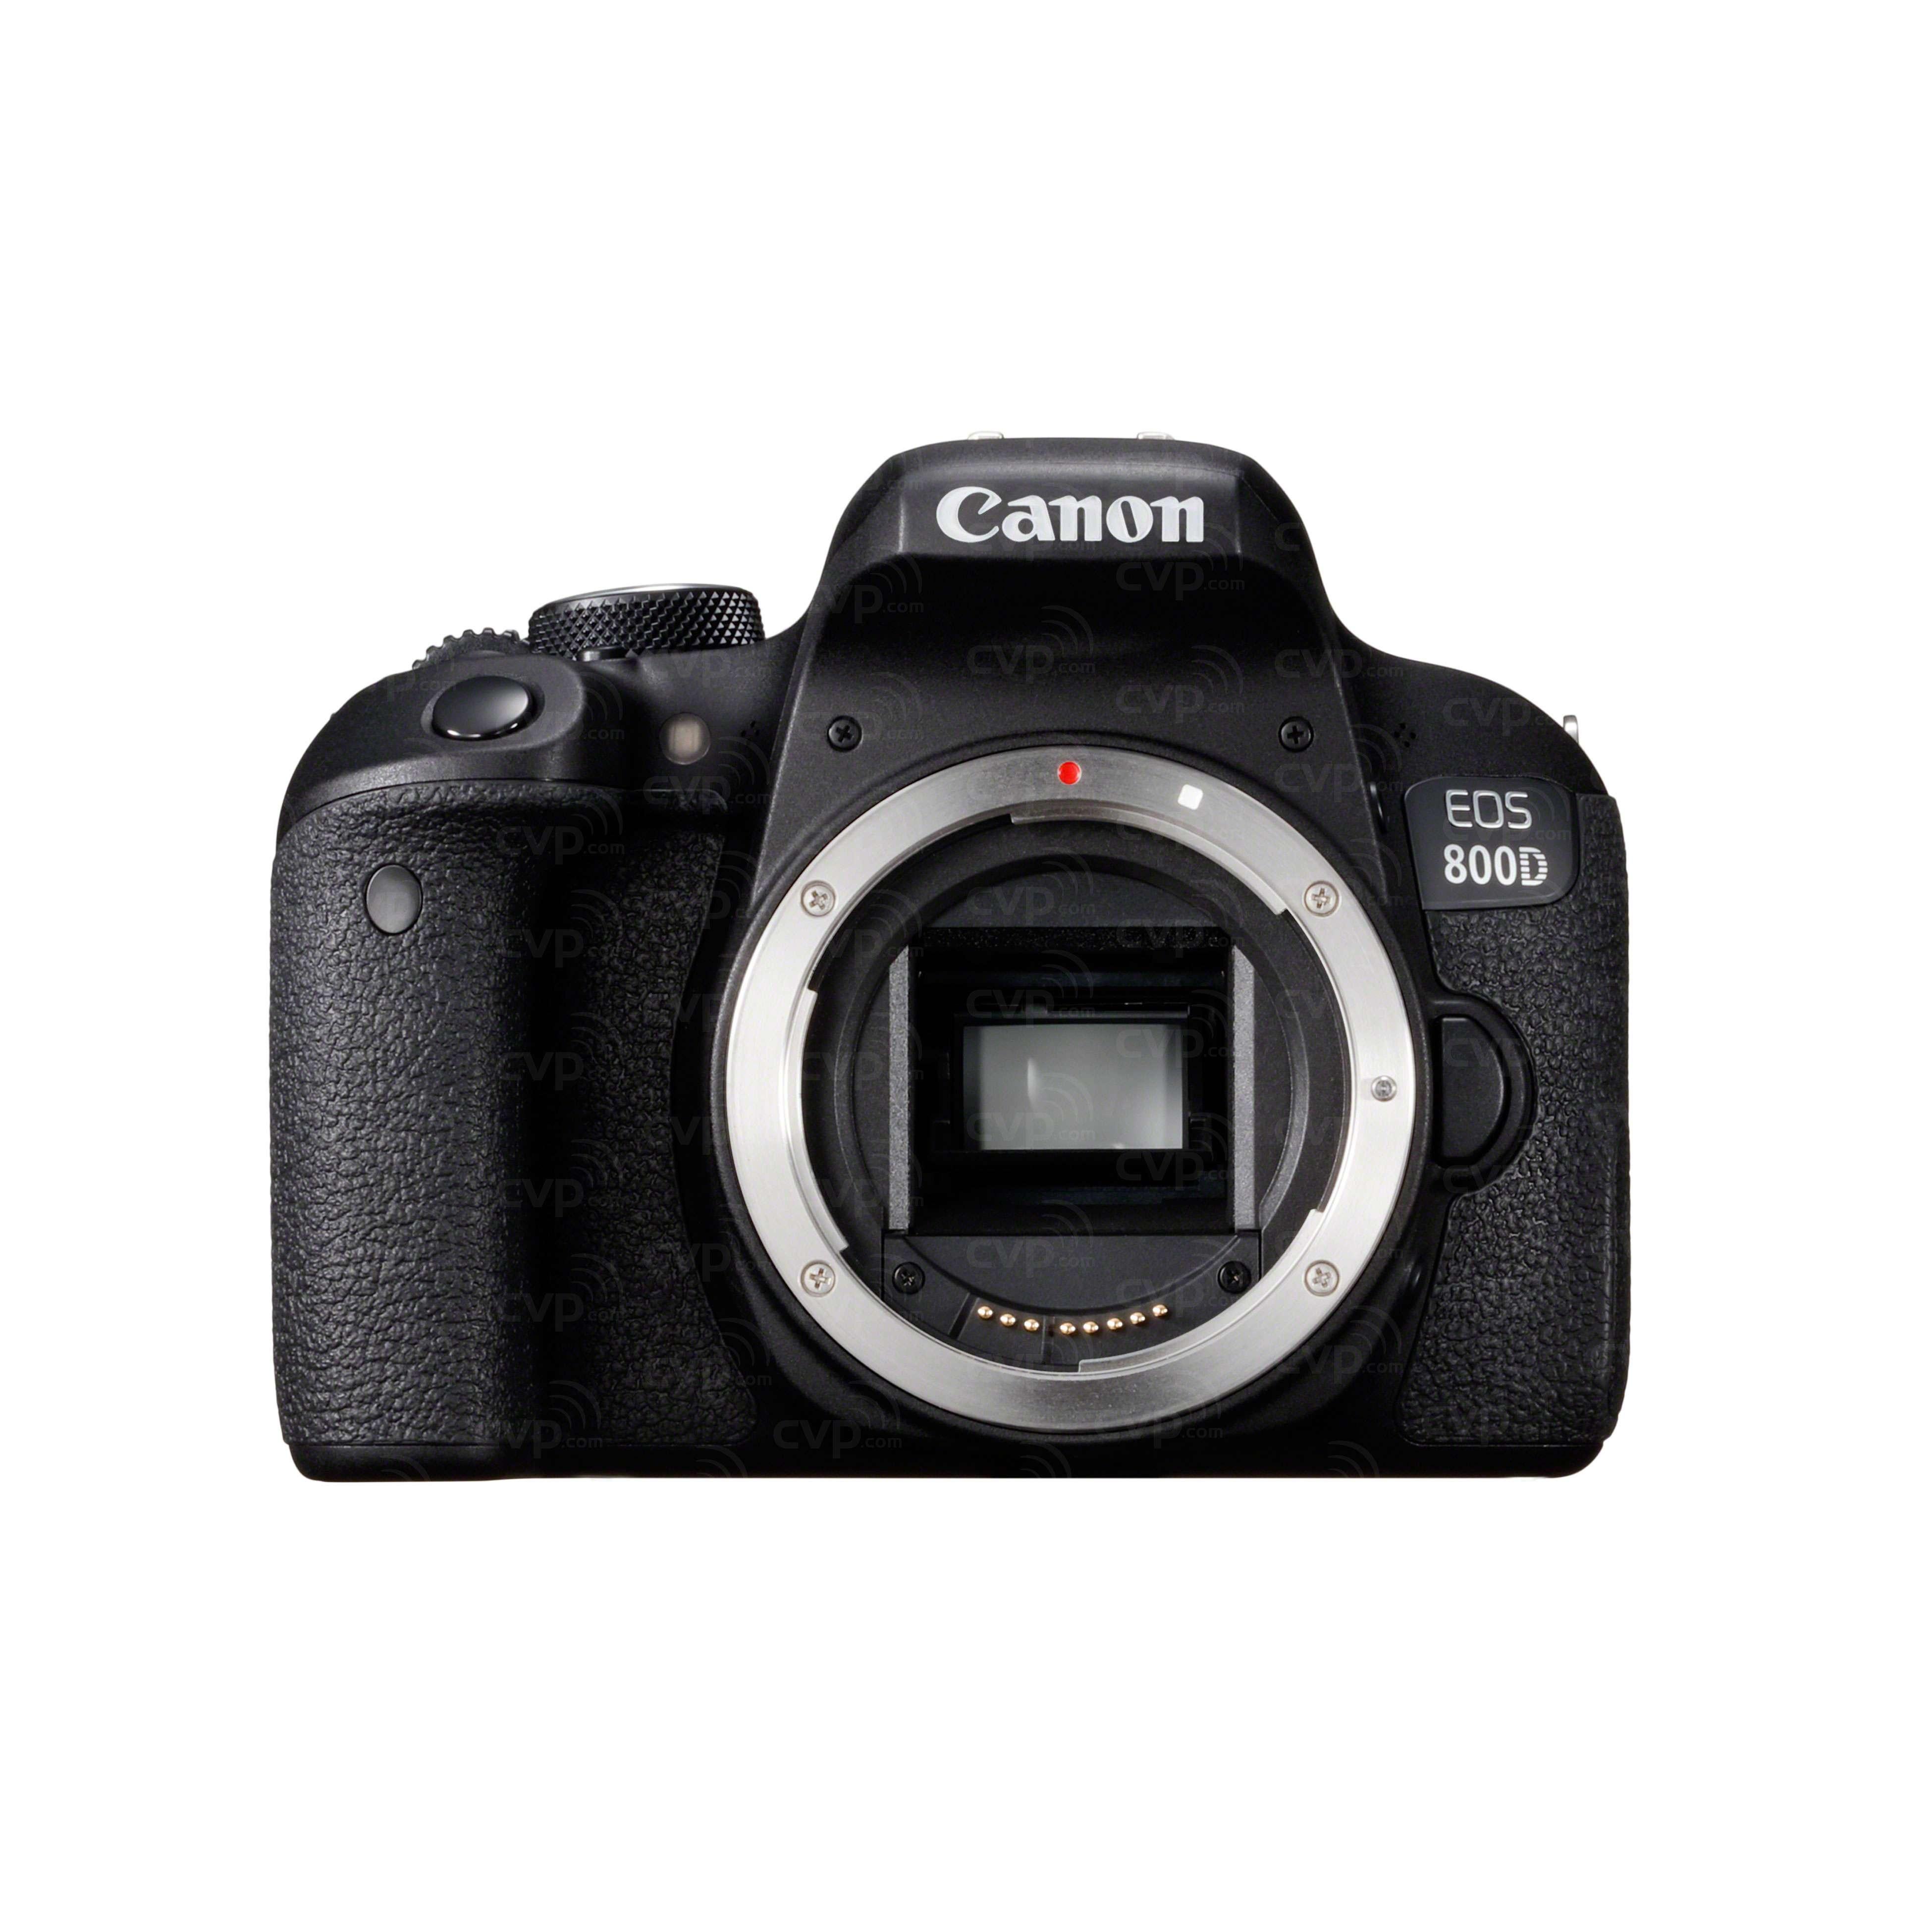 buy canon eos 800d 24 2 megapixel full hd digital slr camera body rh cvp com Canon EOS Digital Camera 1 Canon EOS Rebel XTi Troubleshooting